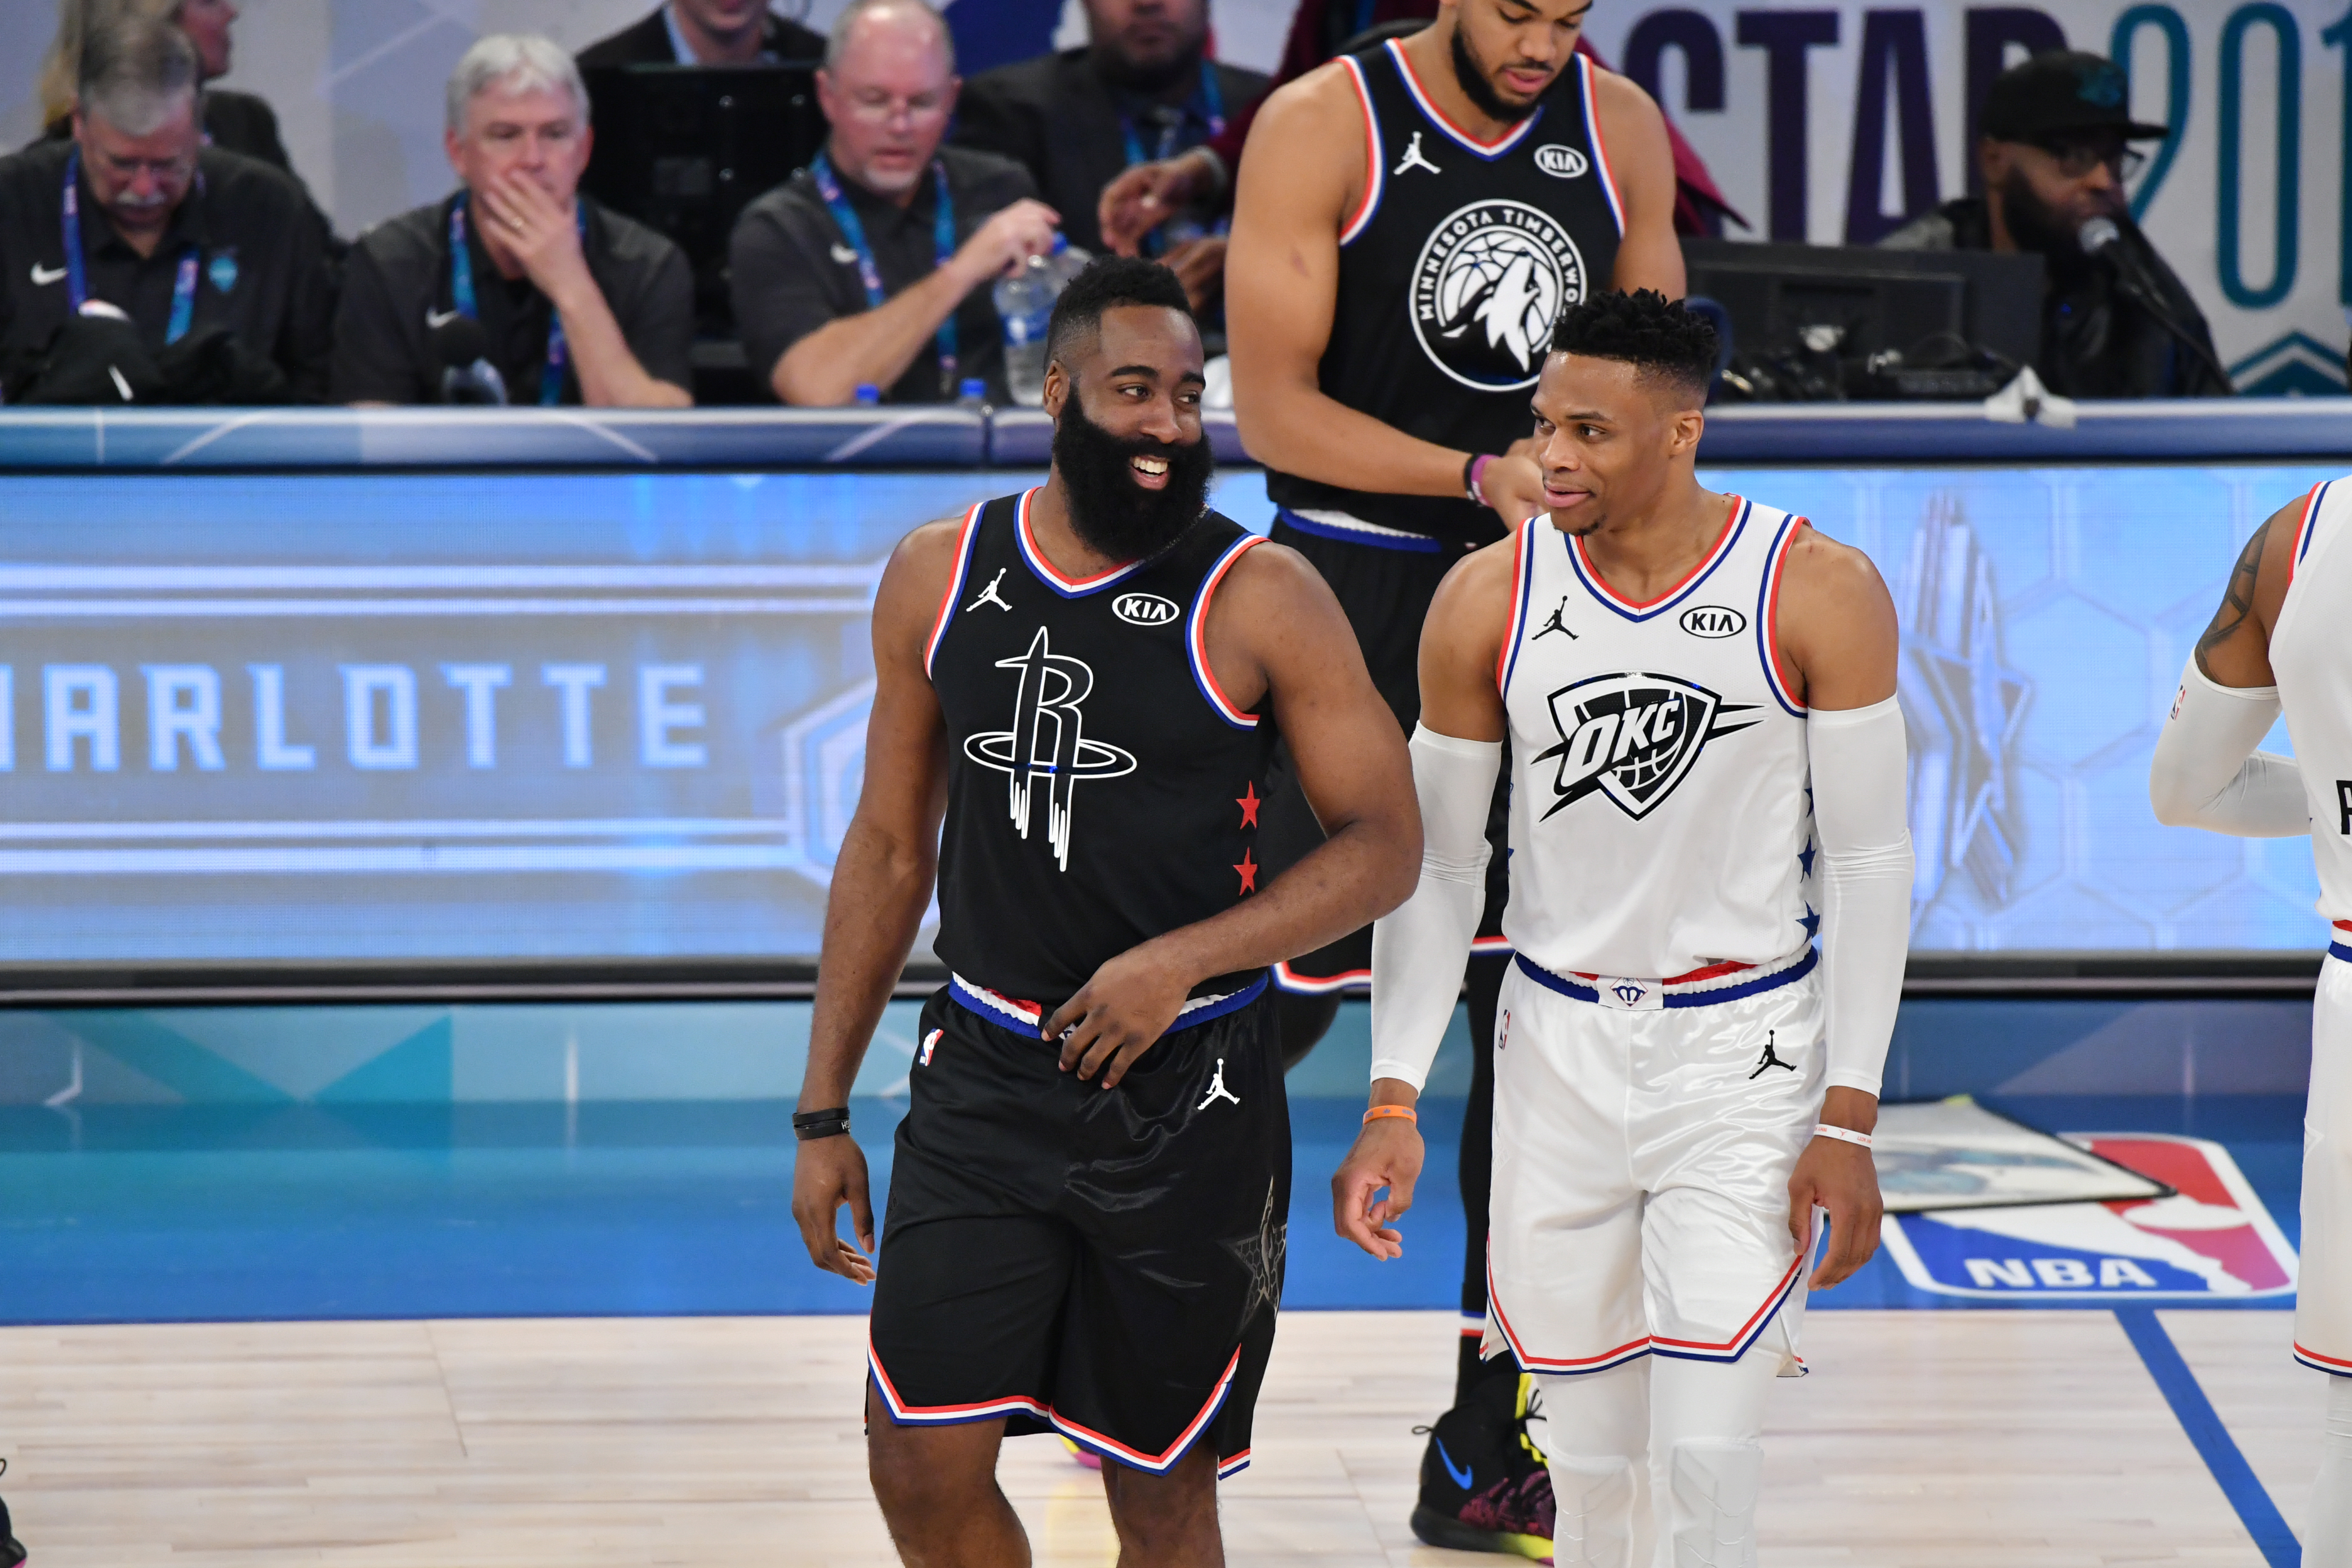 2019 NBA All Star Game